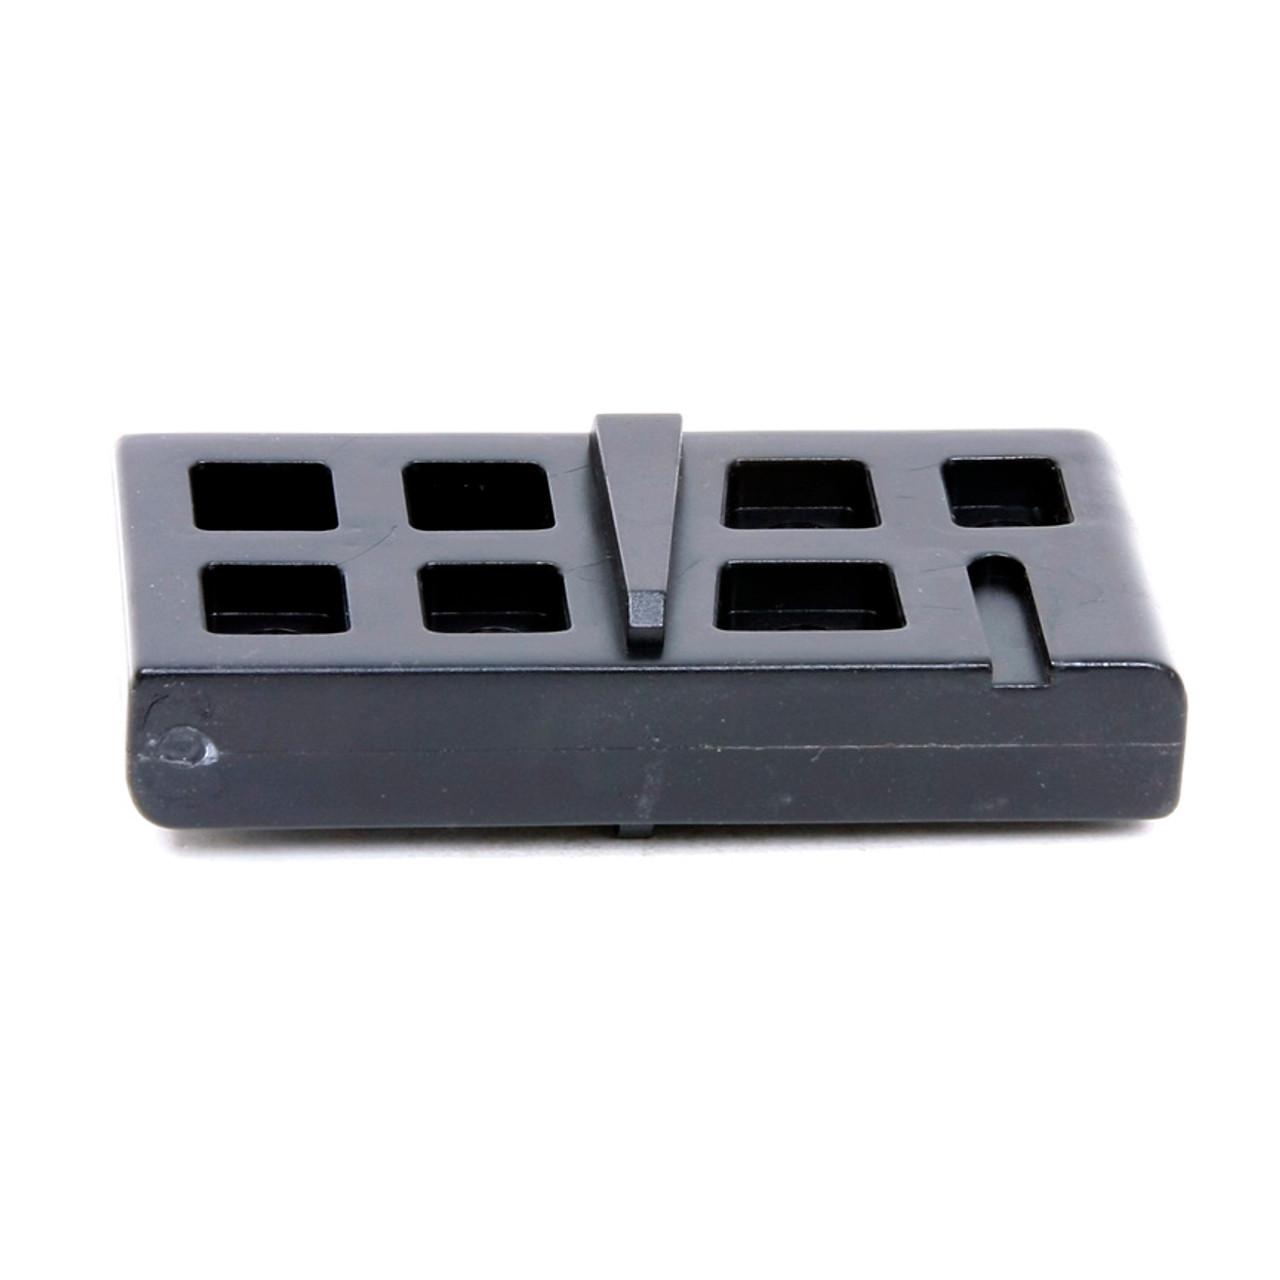 AR-15® / M-16 Lower Receiver Magazine Well Vise Block - Black Polymer